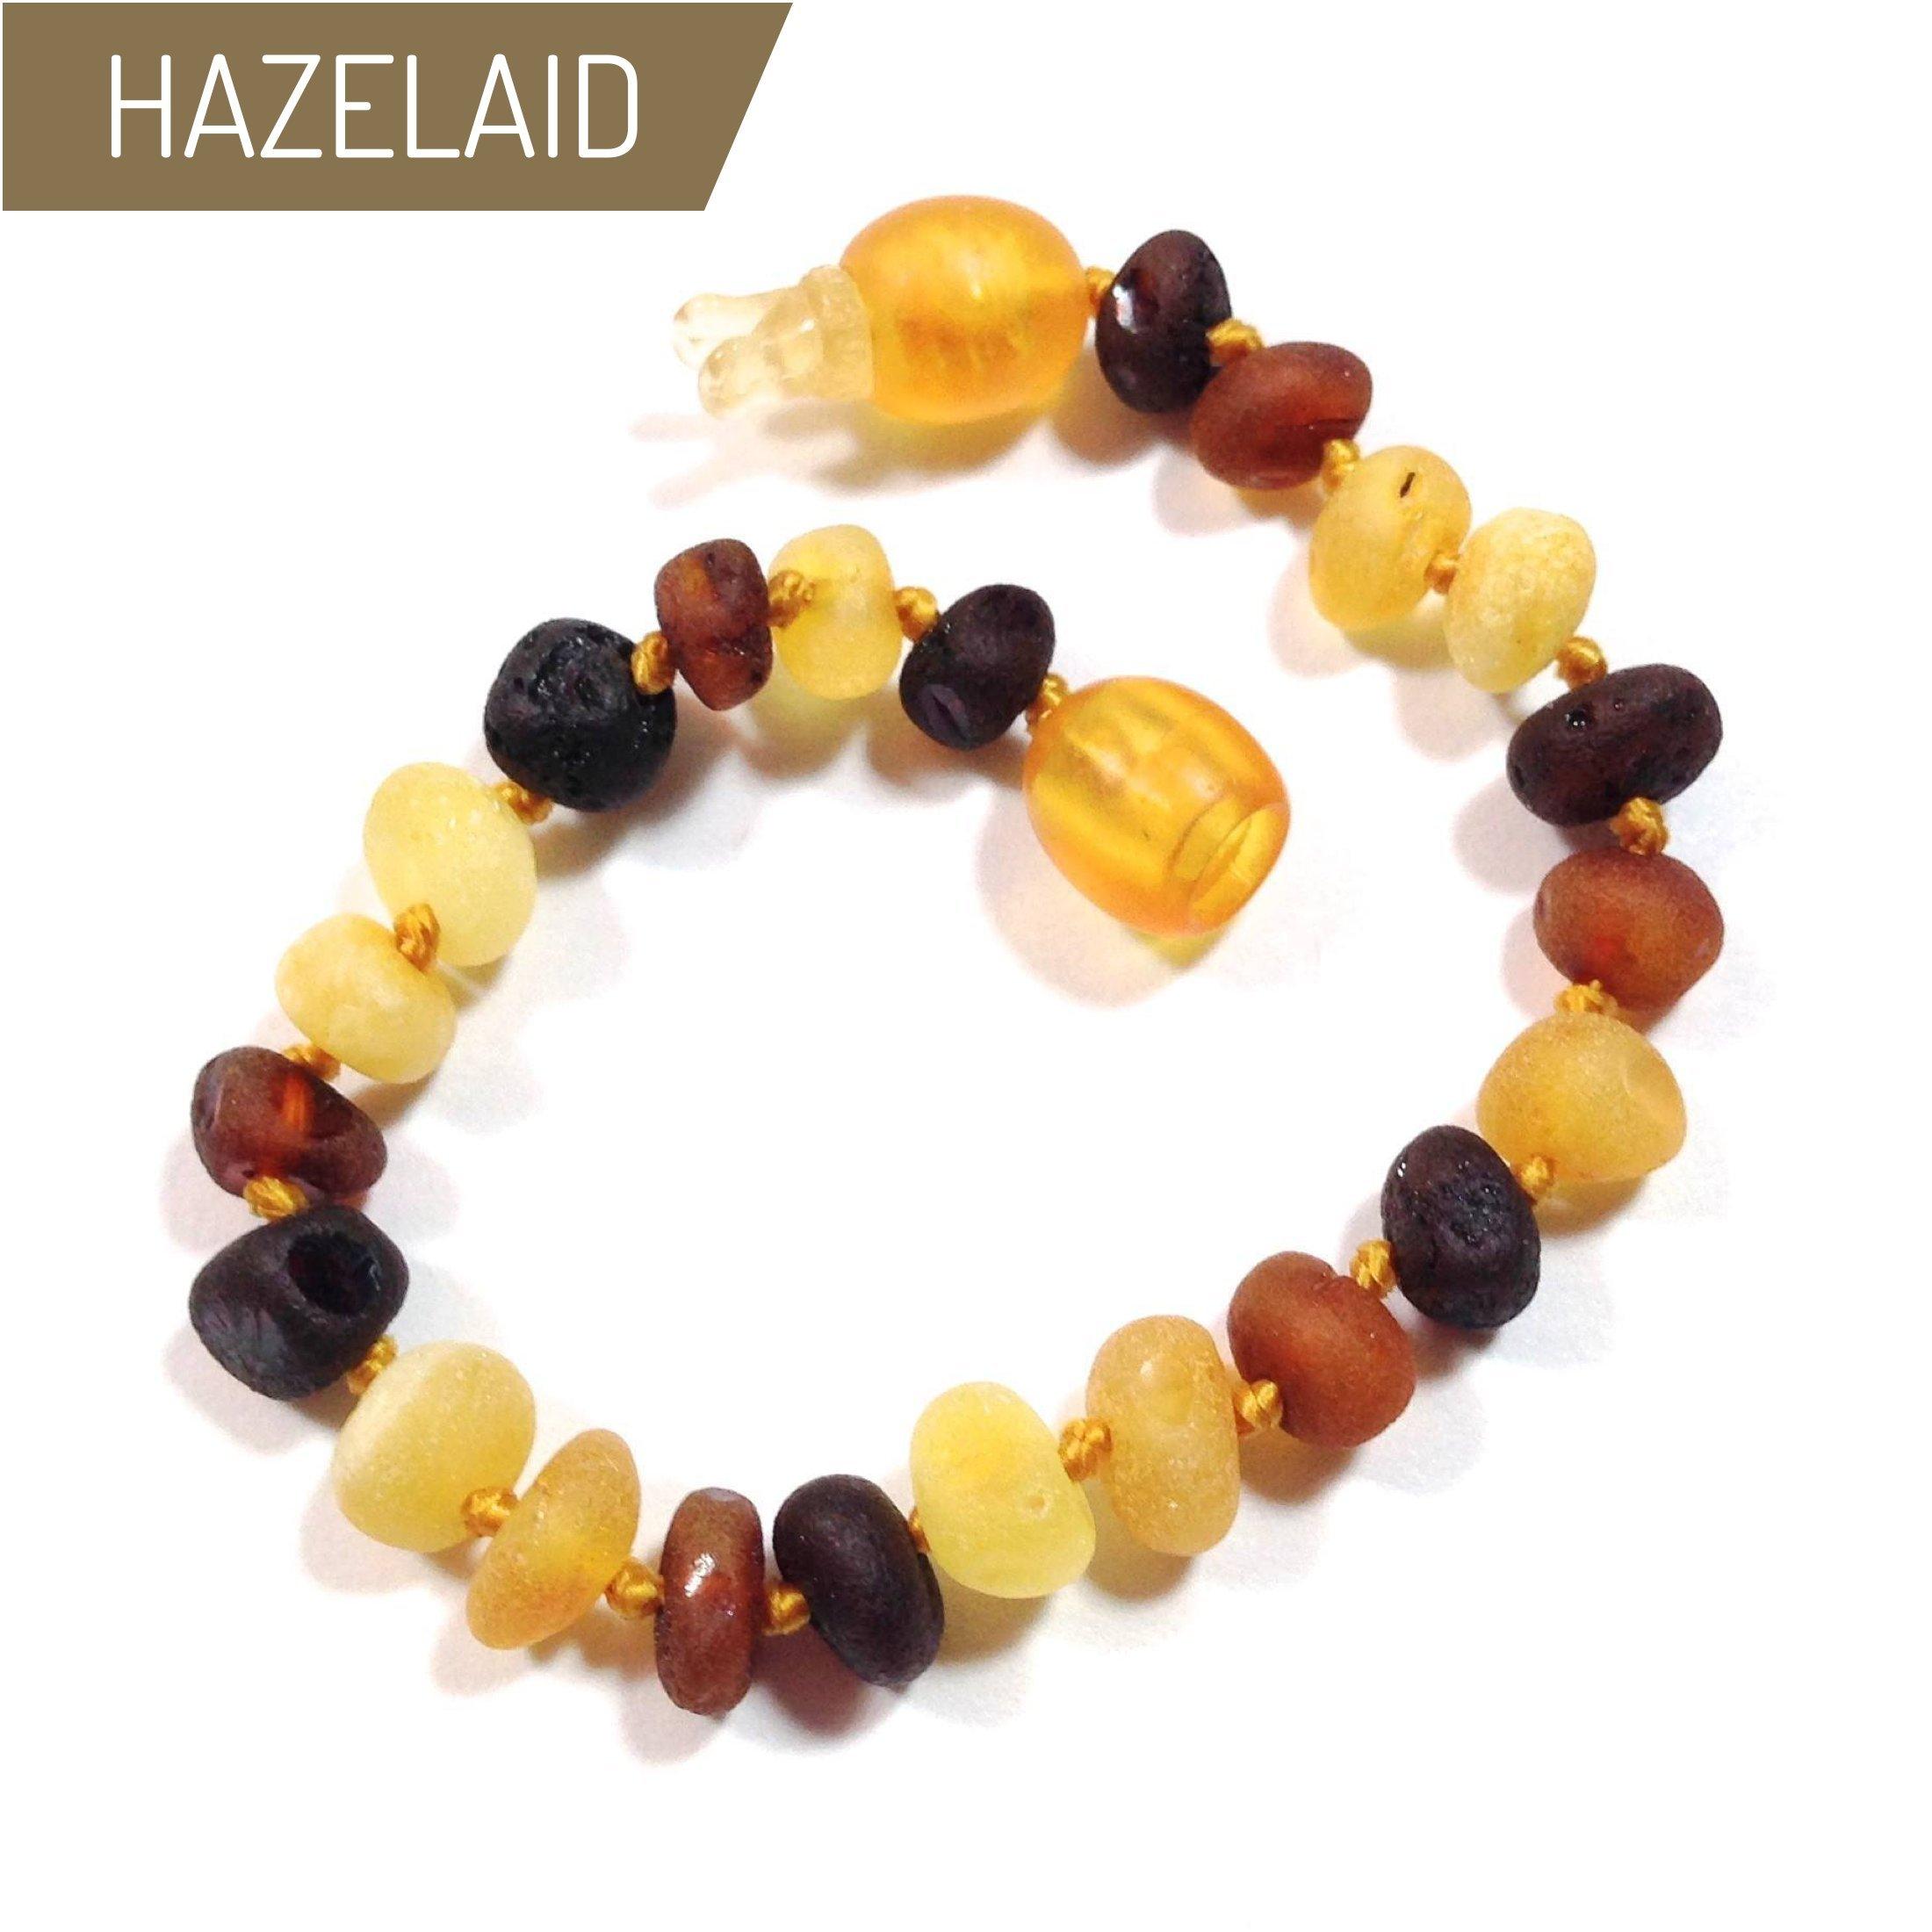 Hazelaid (TM) 5.5'' Pop-Clasp Baltic Amber Multicolored Semi-Polish Bracelet